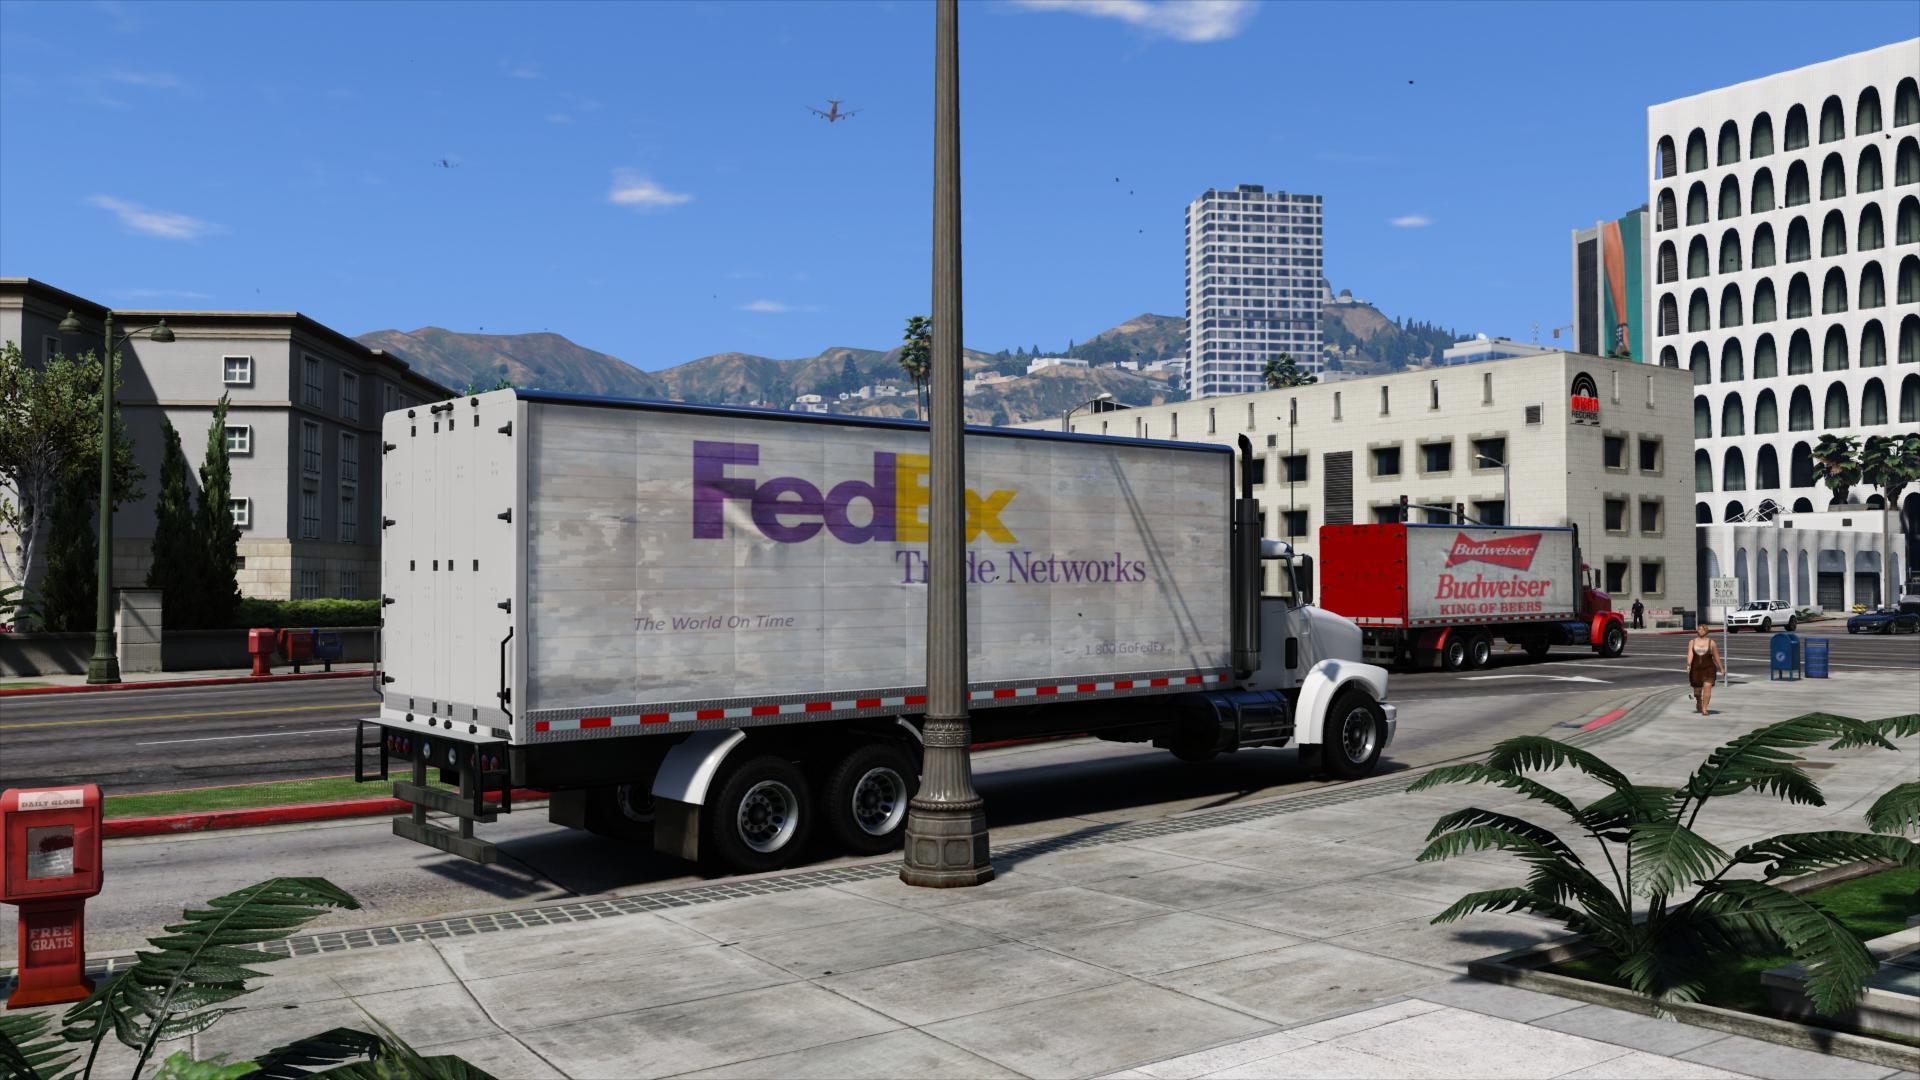 грузовик FedEx в GTA5